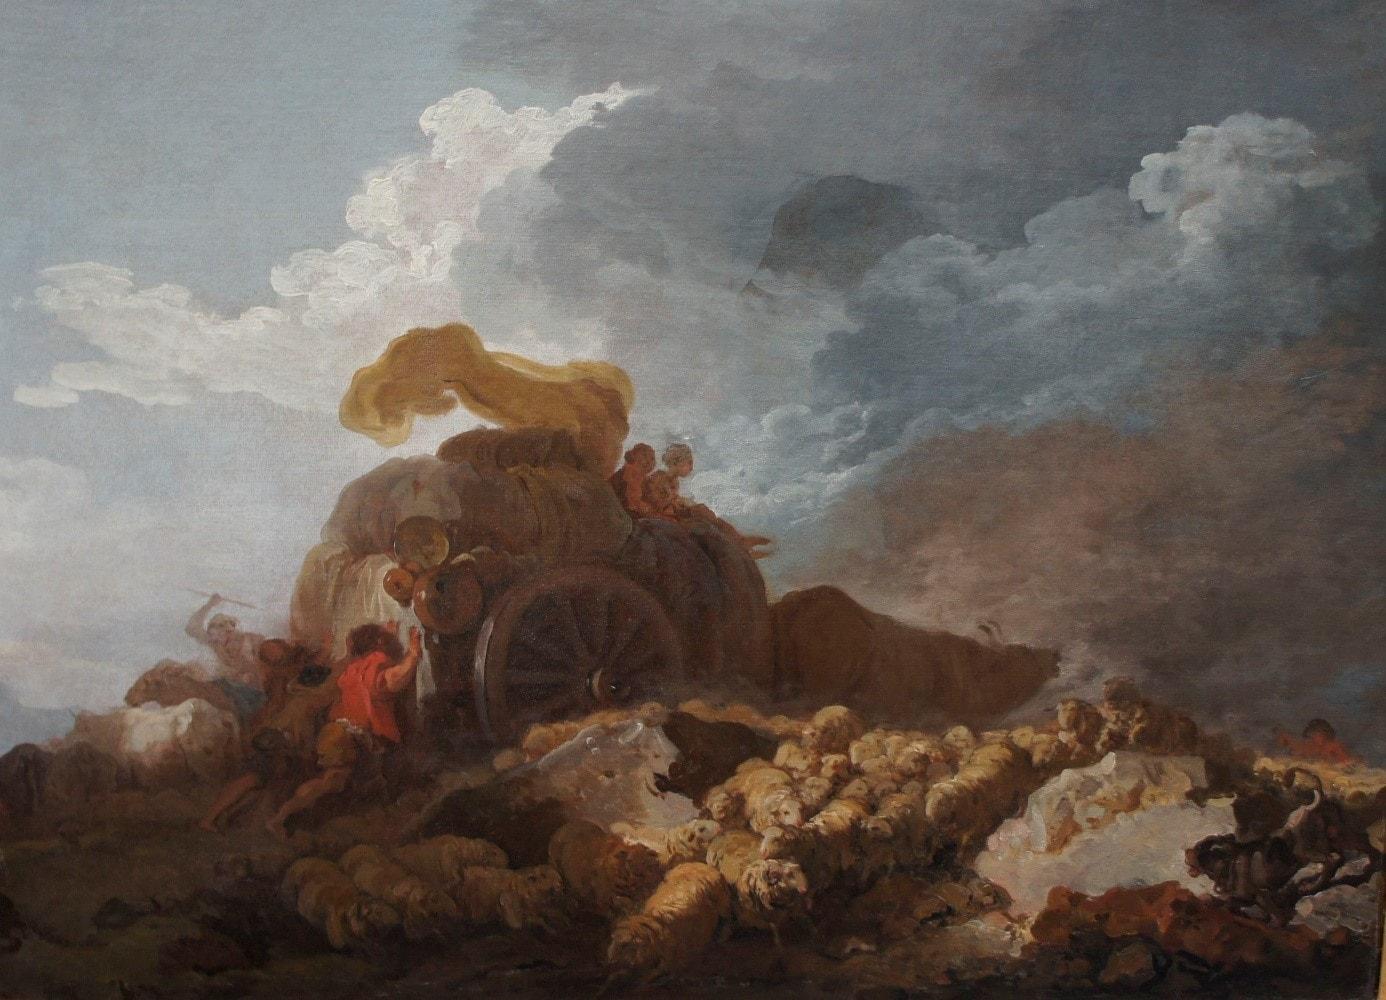 Воз в грязи. Жан Оноре Фрагонар.